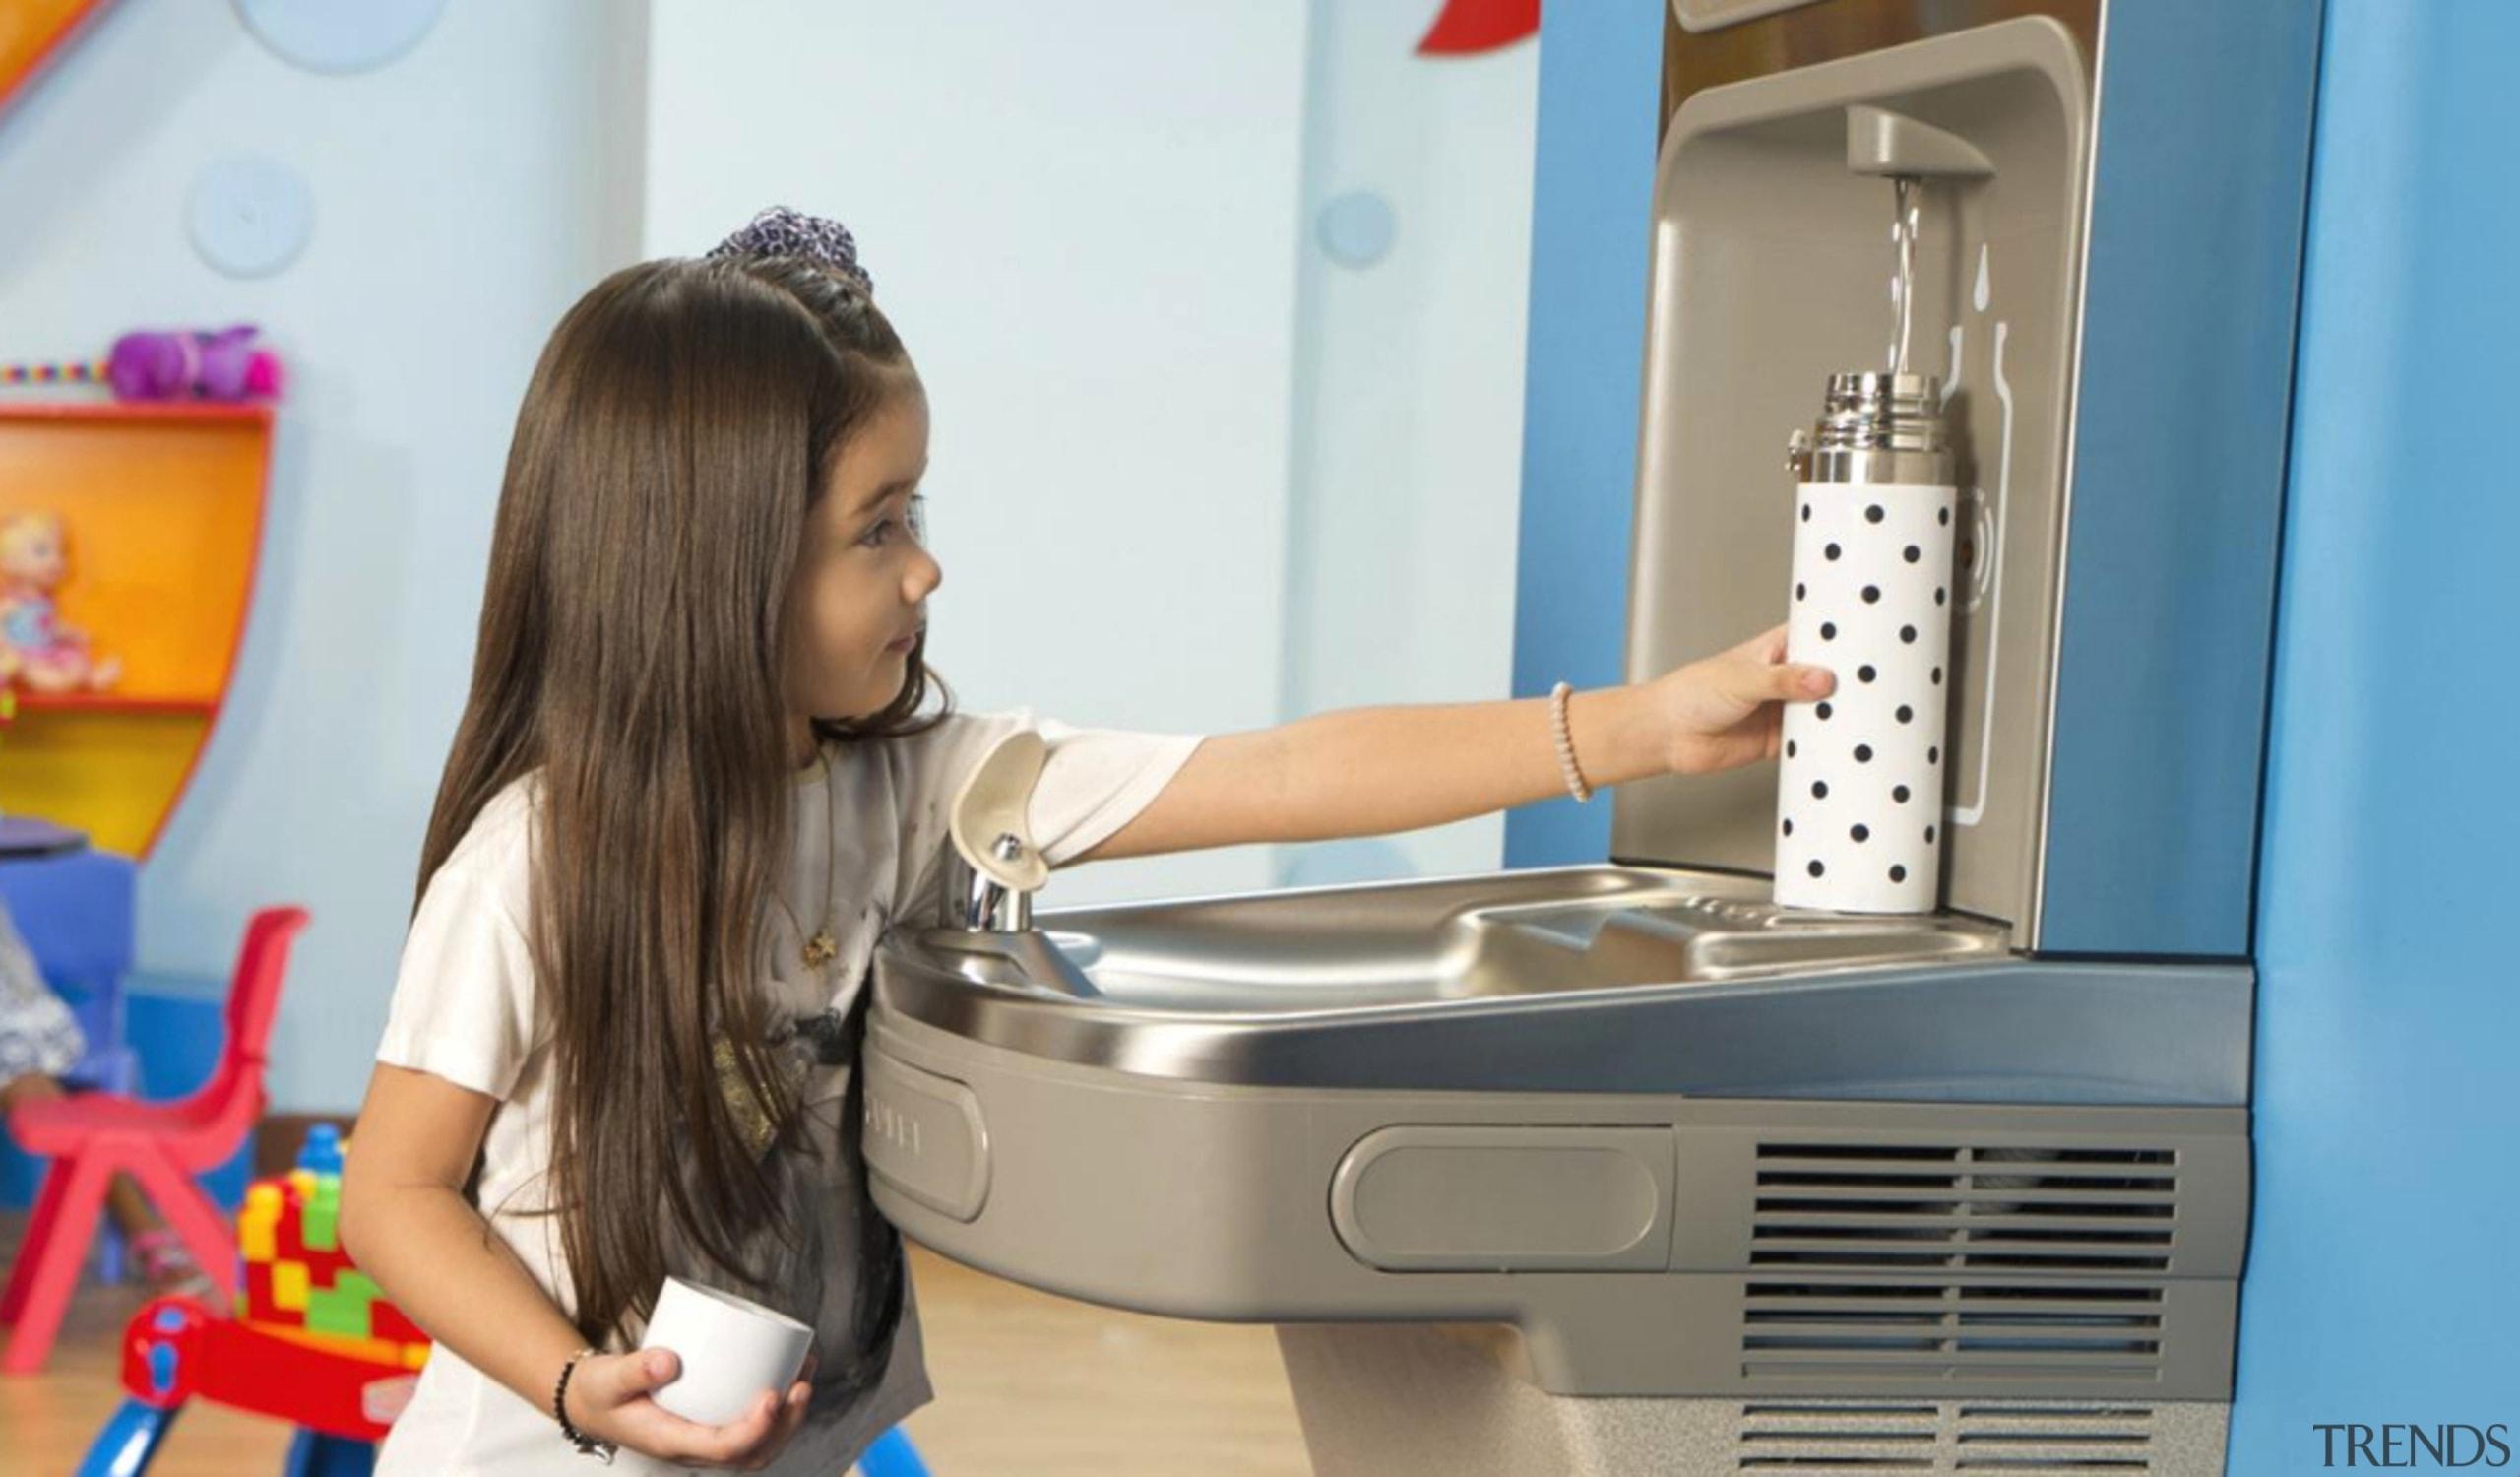 Merquip - home appliance | major appliance | home appliance, major appliance, product, refrigerator, room, gray